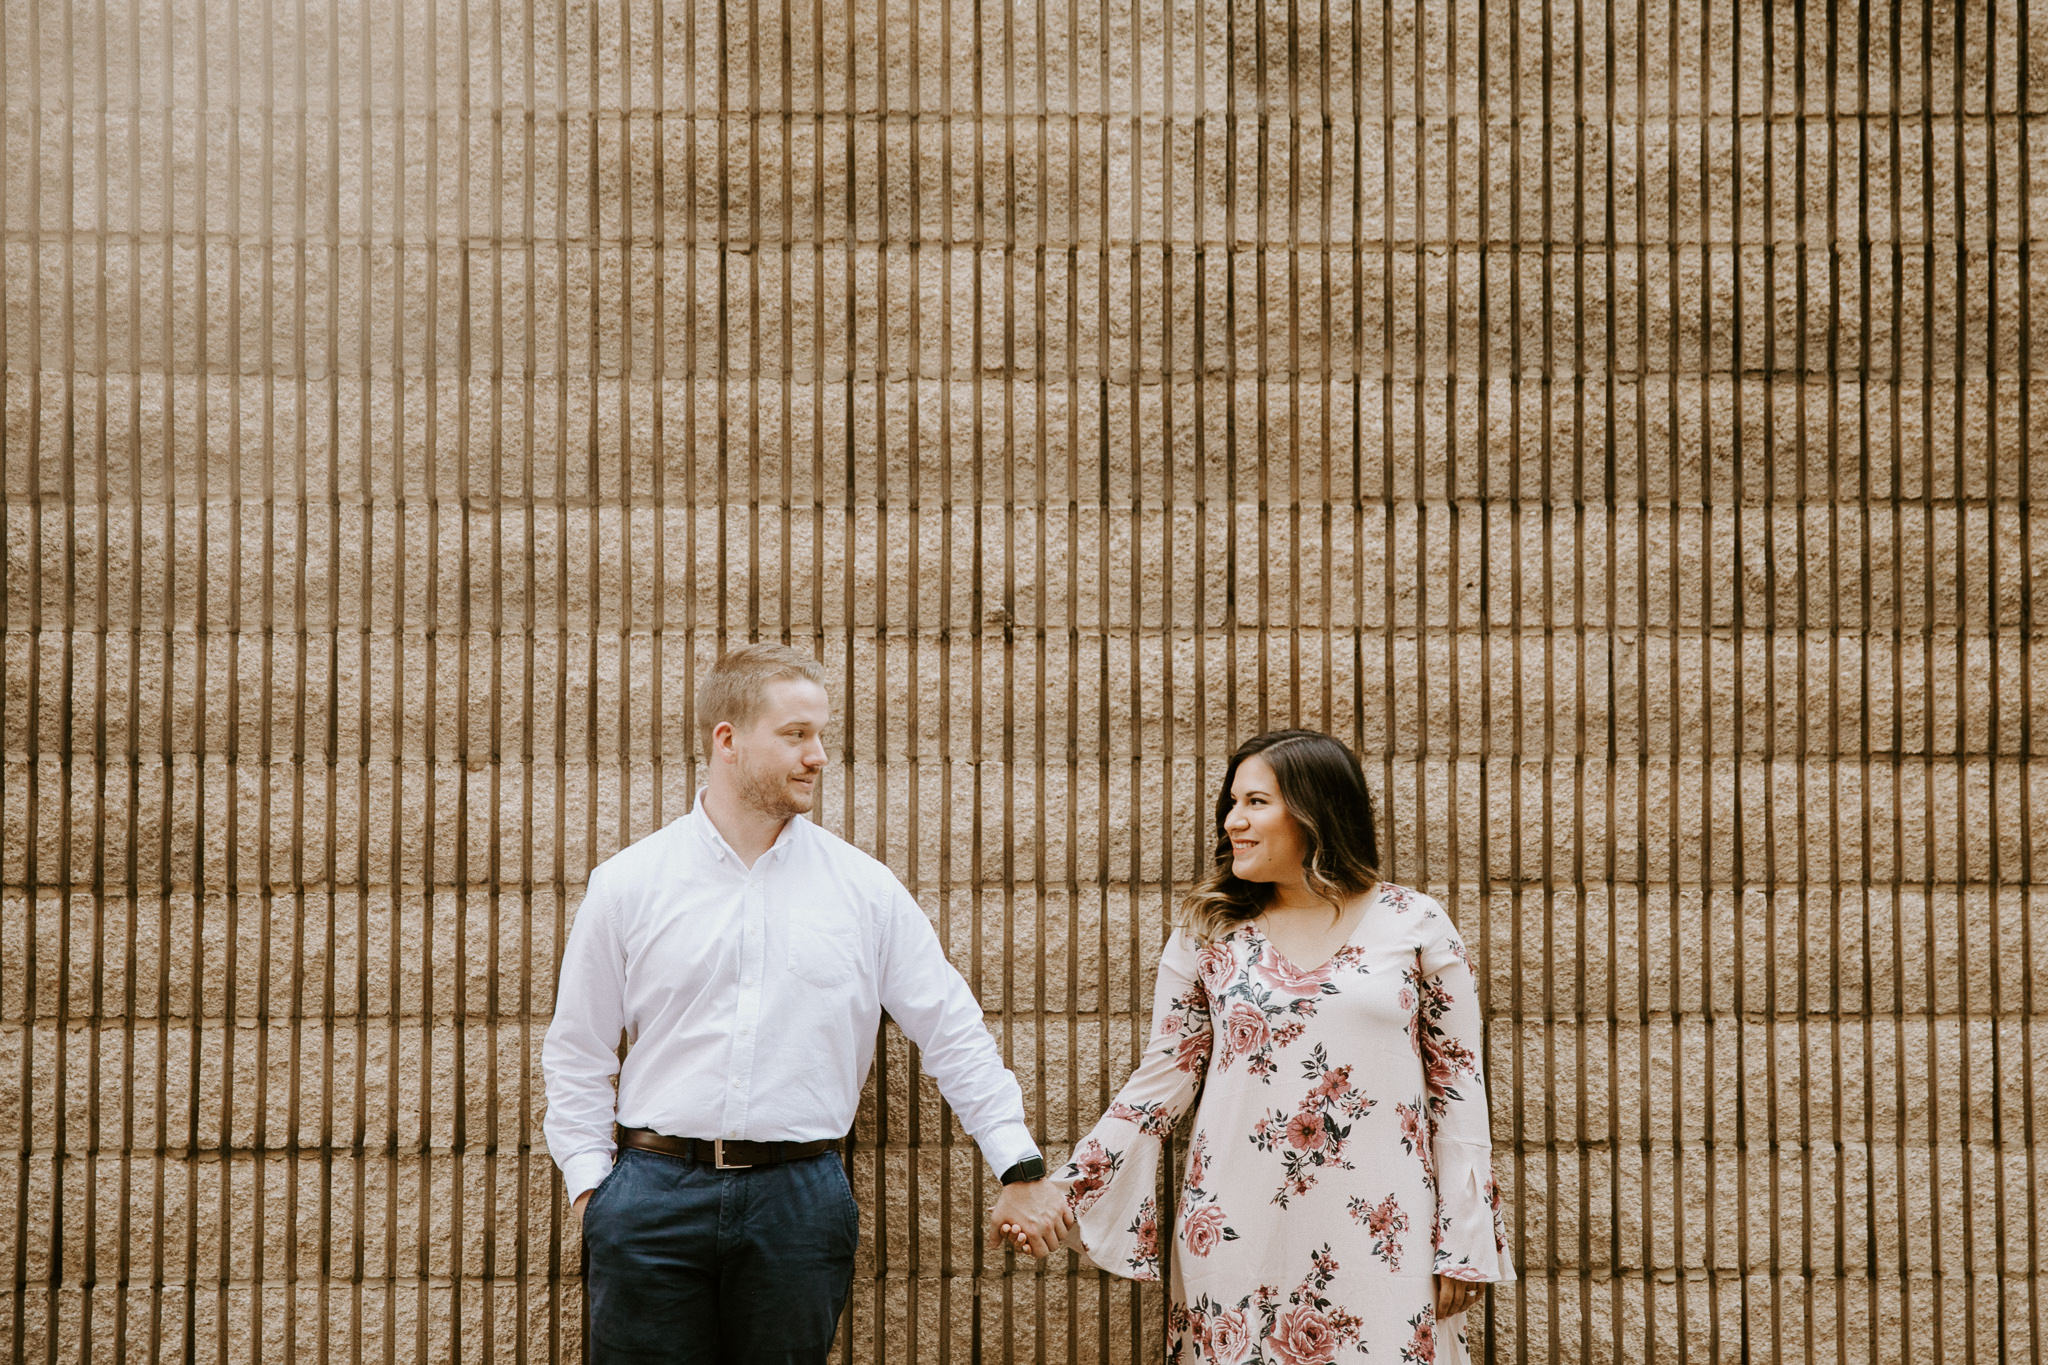 Engagement - Downtown Roanoke -  Wedding Photographer - Virginia - Best - Pat Cori Photography-5.jpg